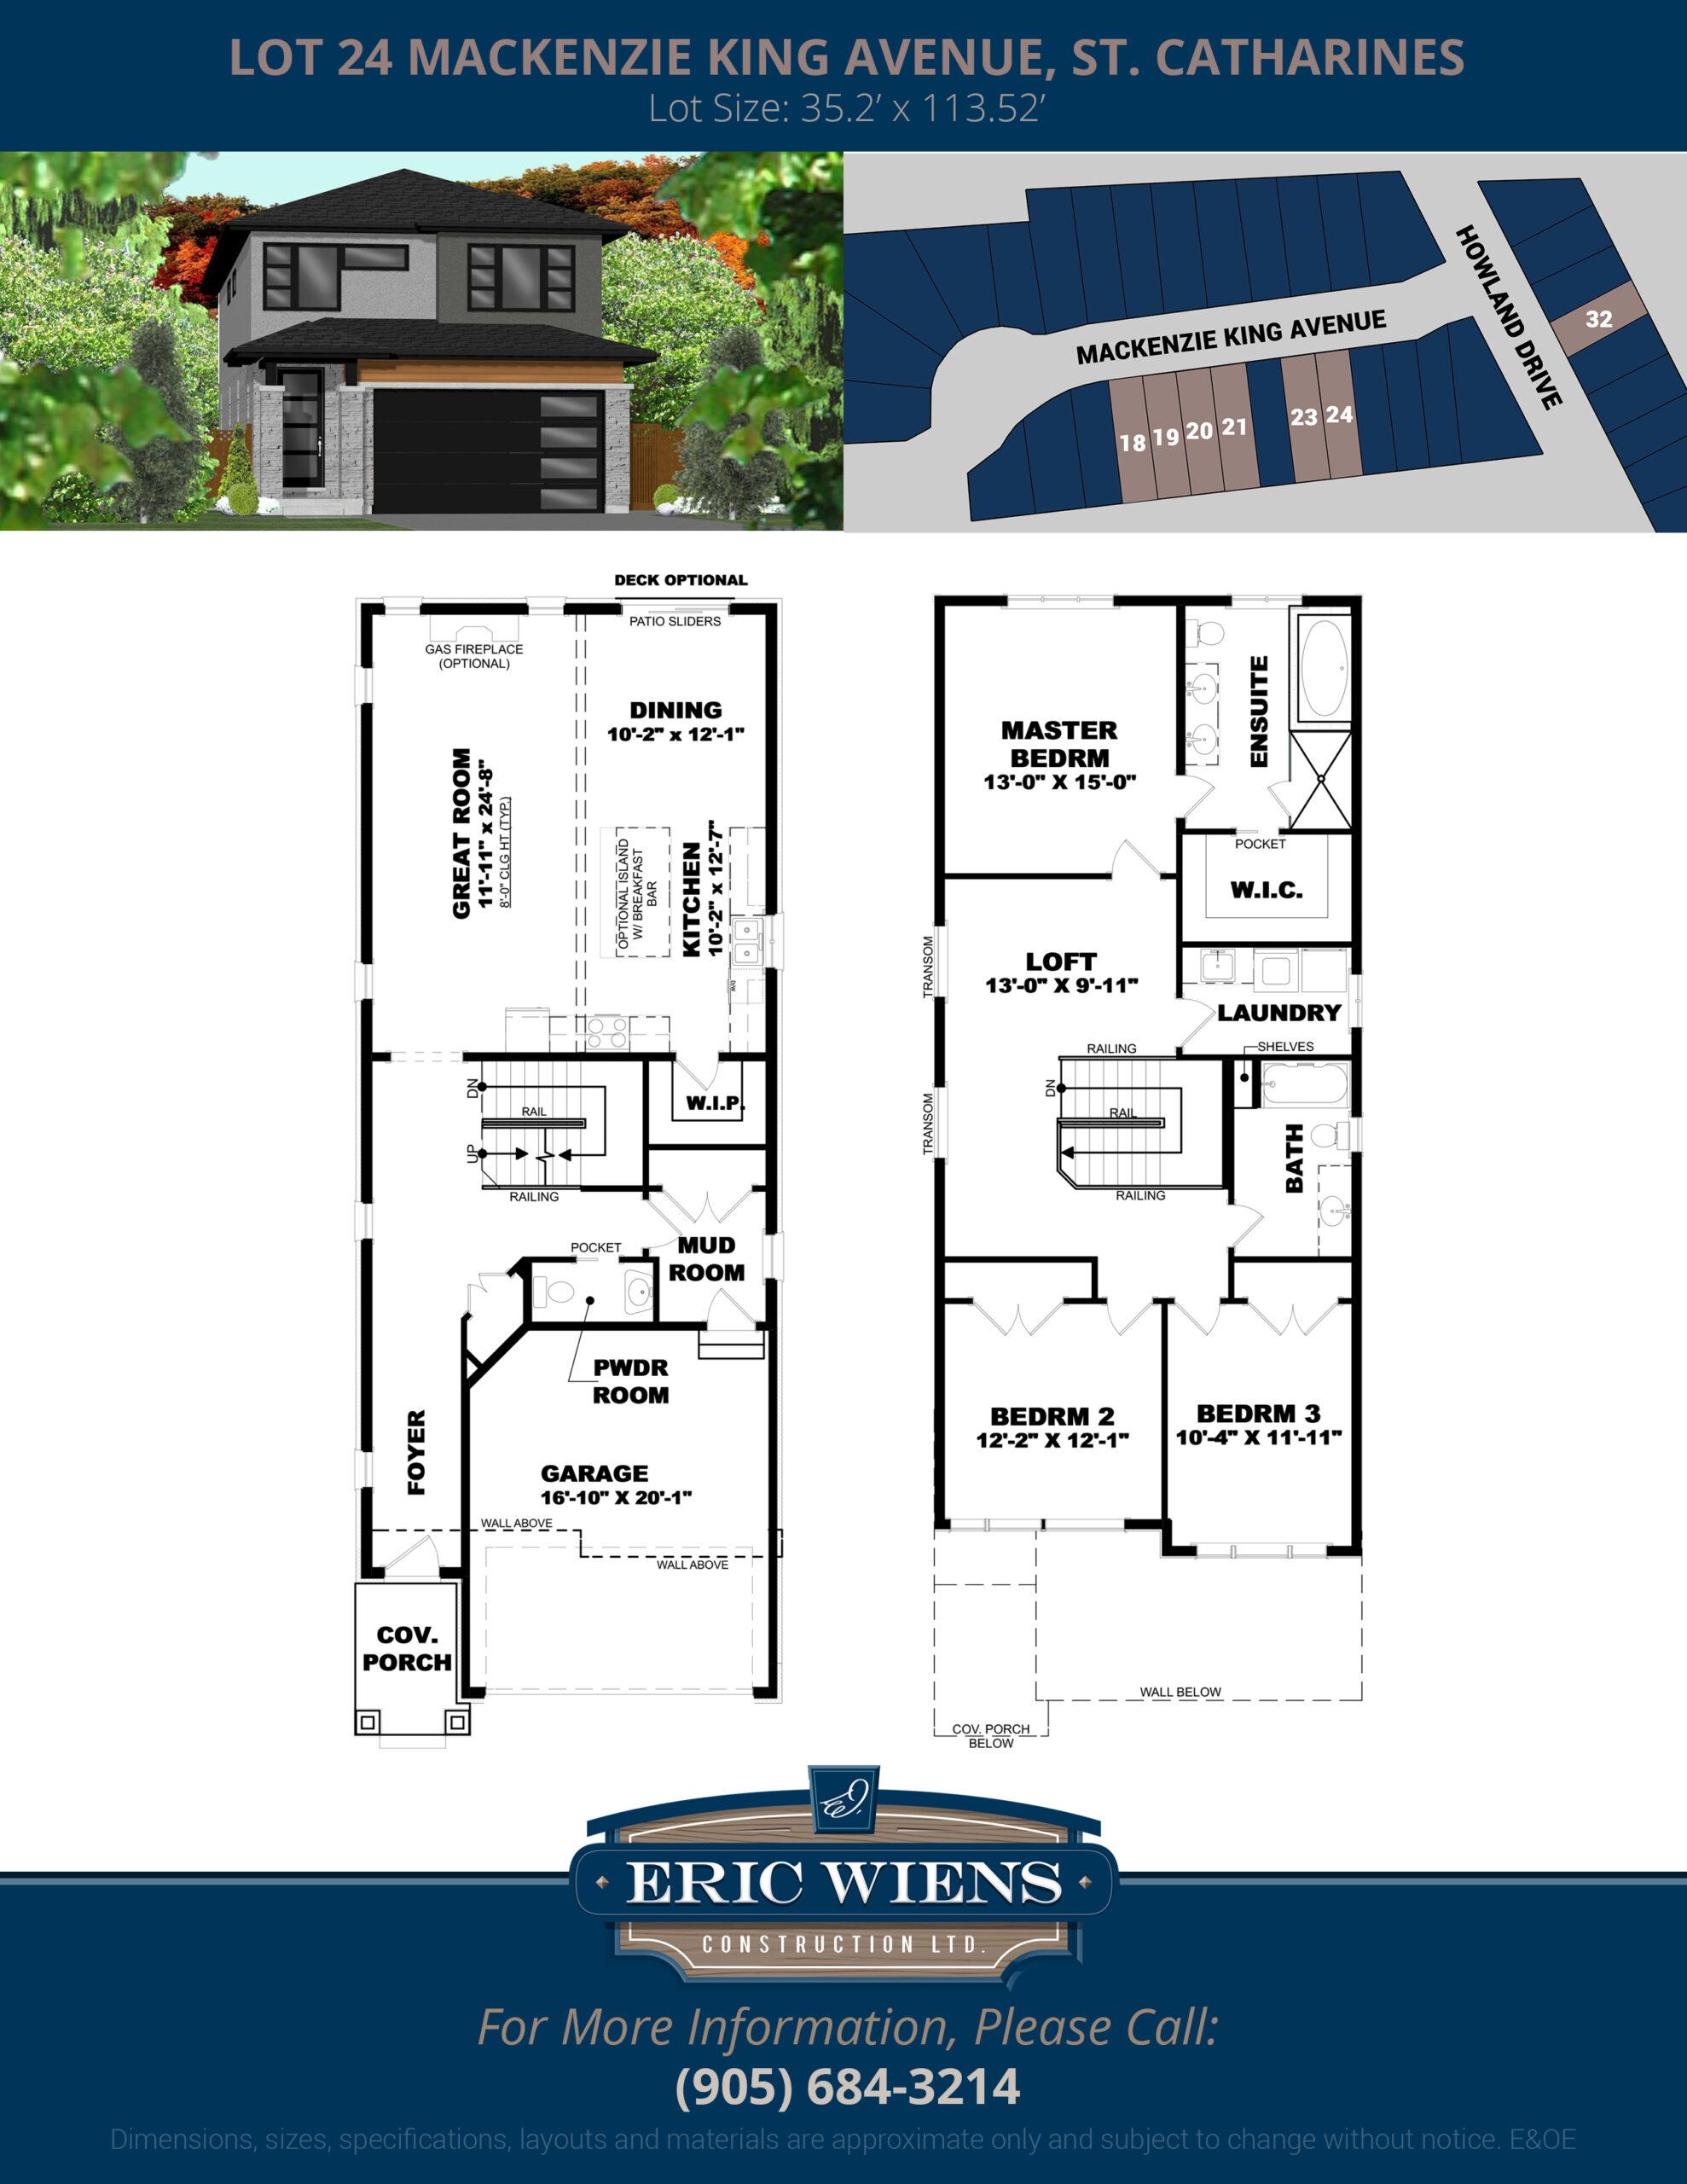 Lot 24 Mackenzie King Avenue Floor Plan